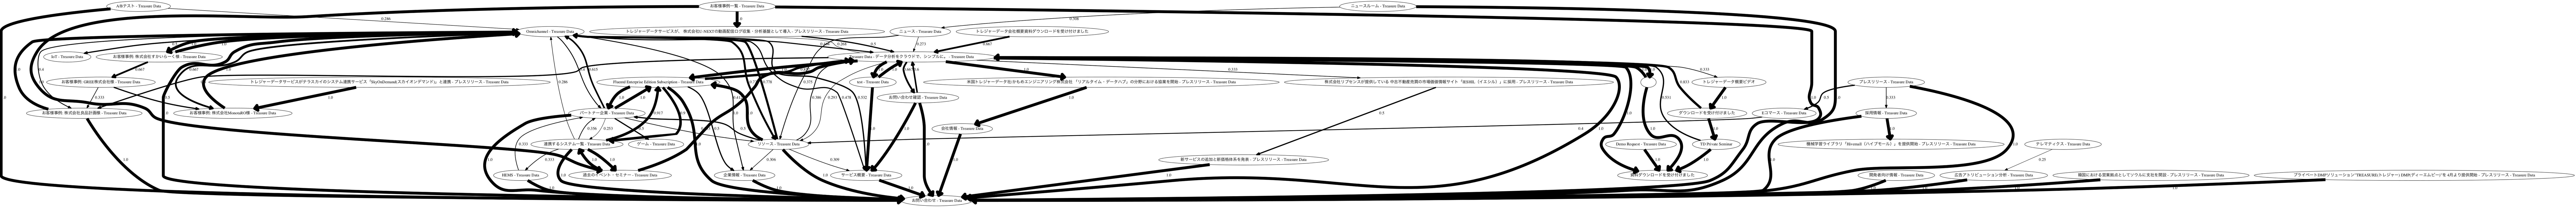 f:id:doryokujin:20160616163355p:plain